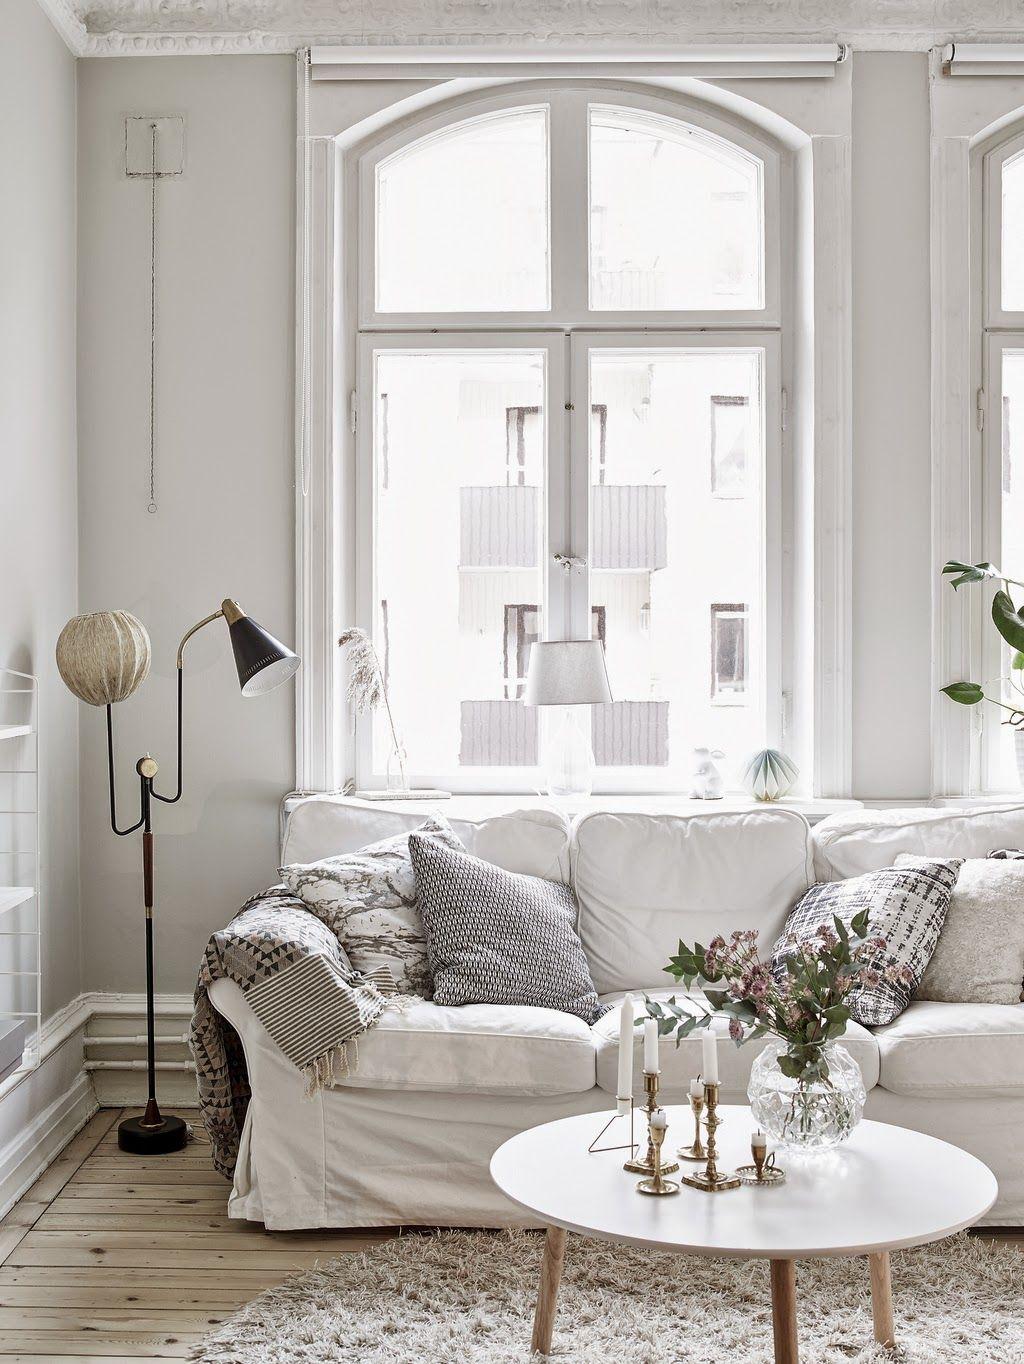 Fantastic one room scandinavian wonder daily dream decor ...